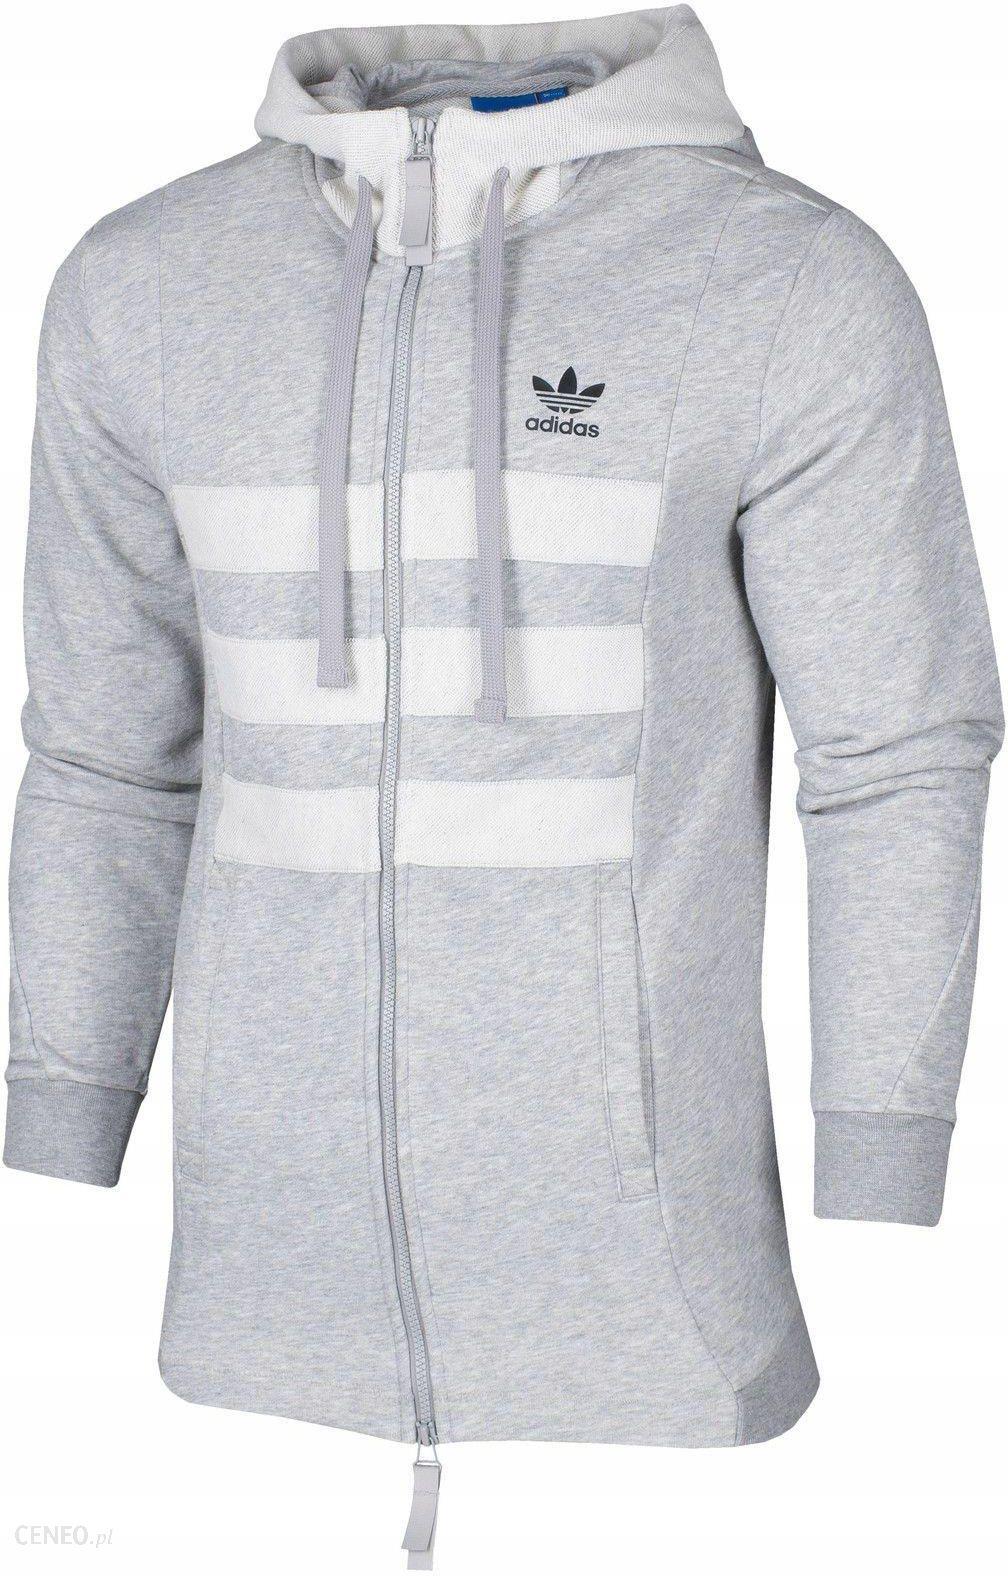 Adidas Originals Bluza Street Modern AY9196 M Ceny i opinie Ceneo.pl